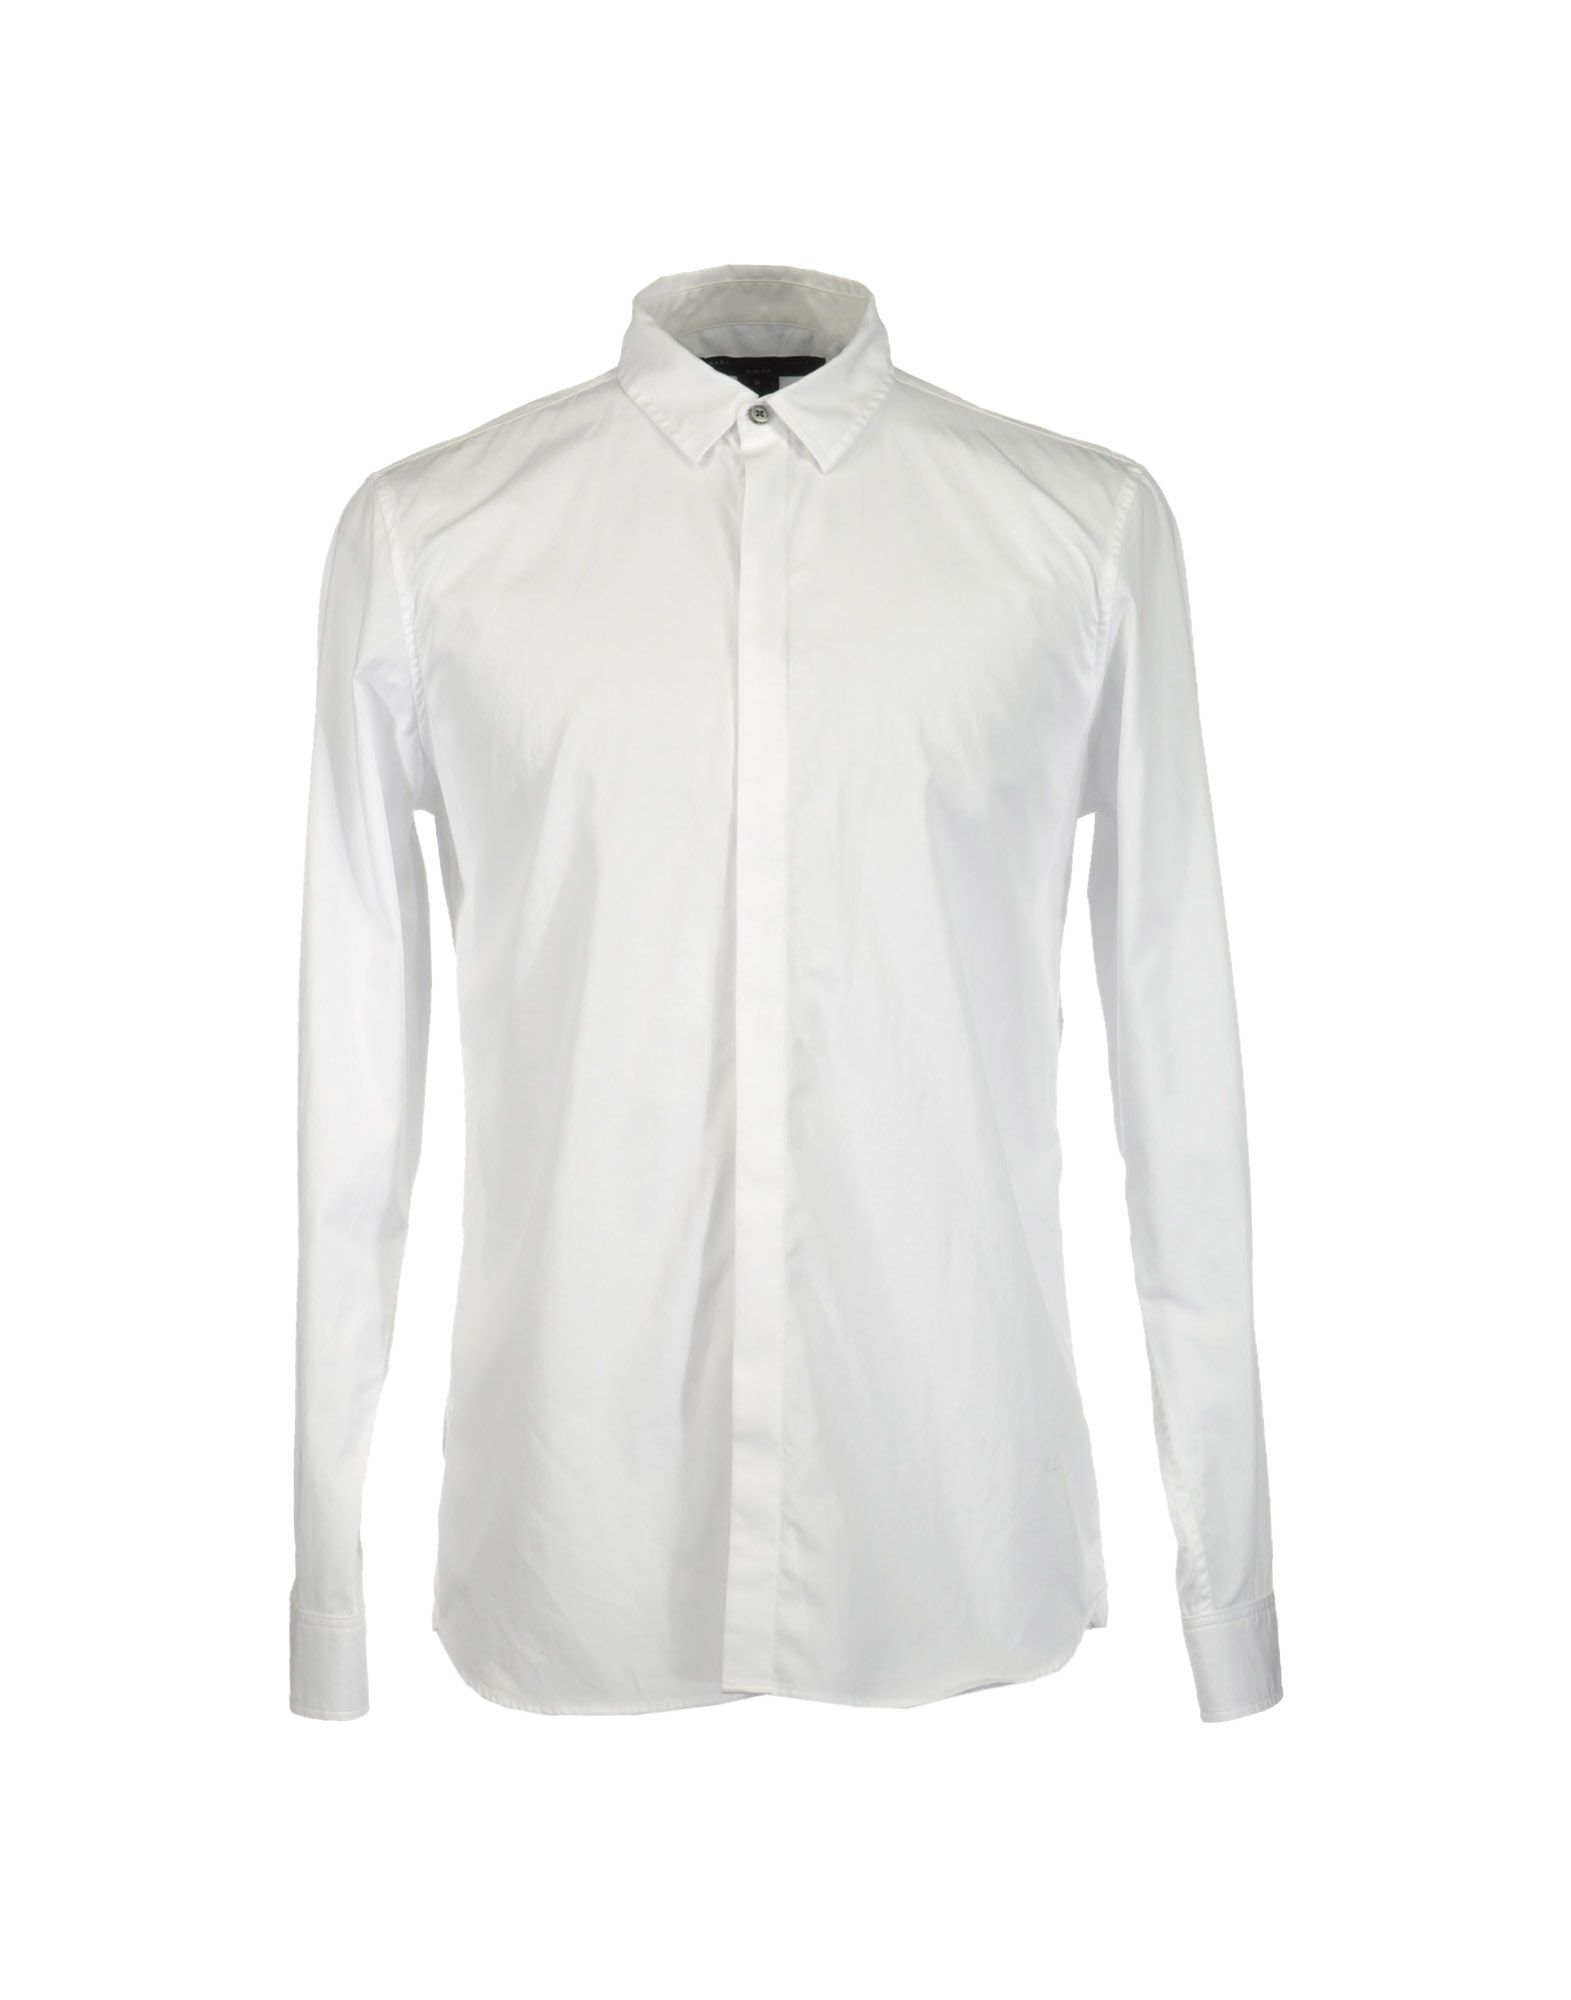 Фото - MARC BY MARC JACOBS Рубашка с длинными рукавами рубашка однотонная с длинными рукавами